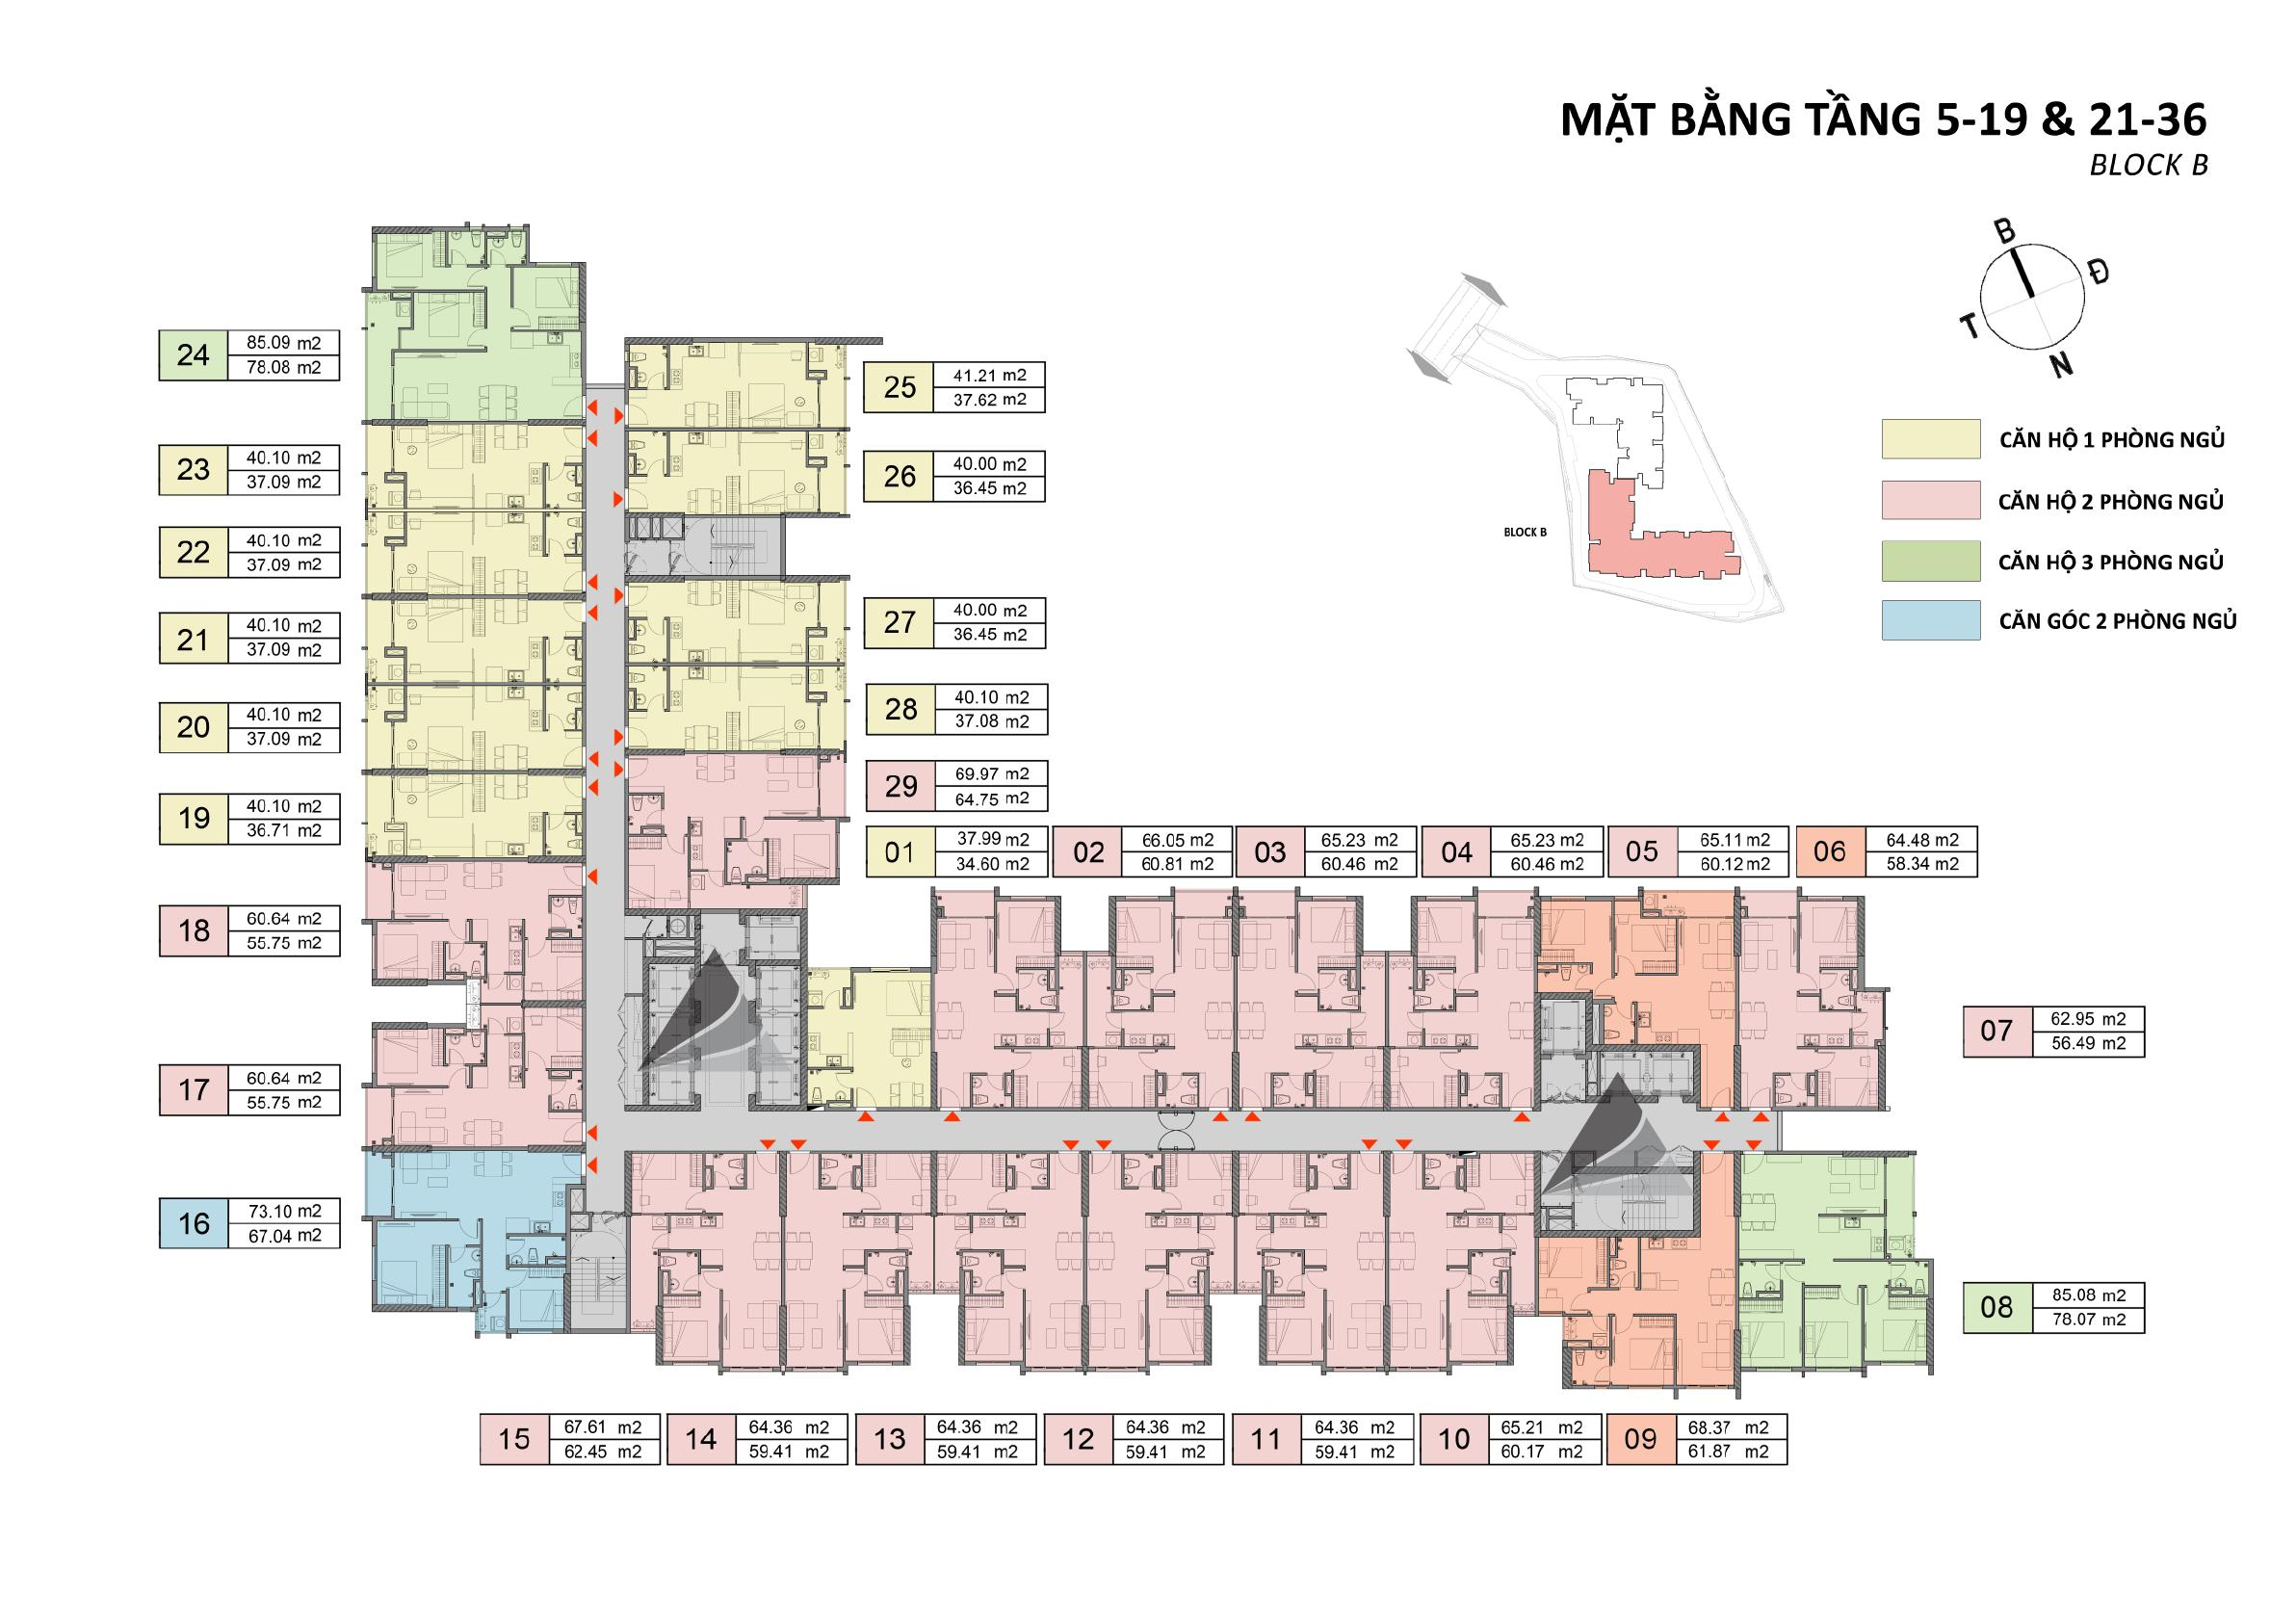 mat bang tang opal skyline block b tang 5 19 tang 21 36 - OPAL SKYLINE